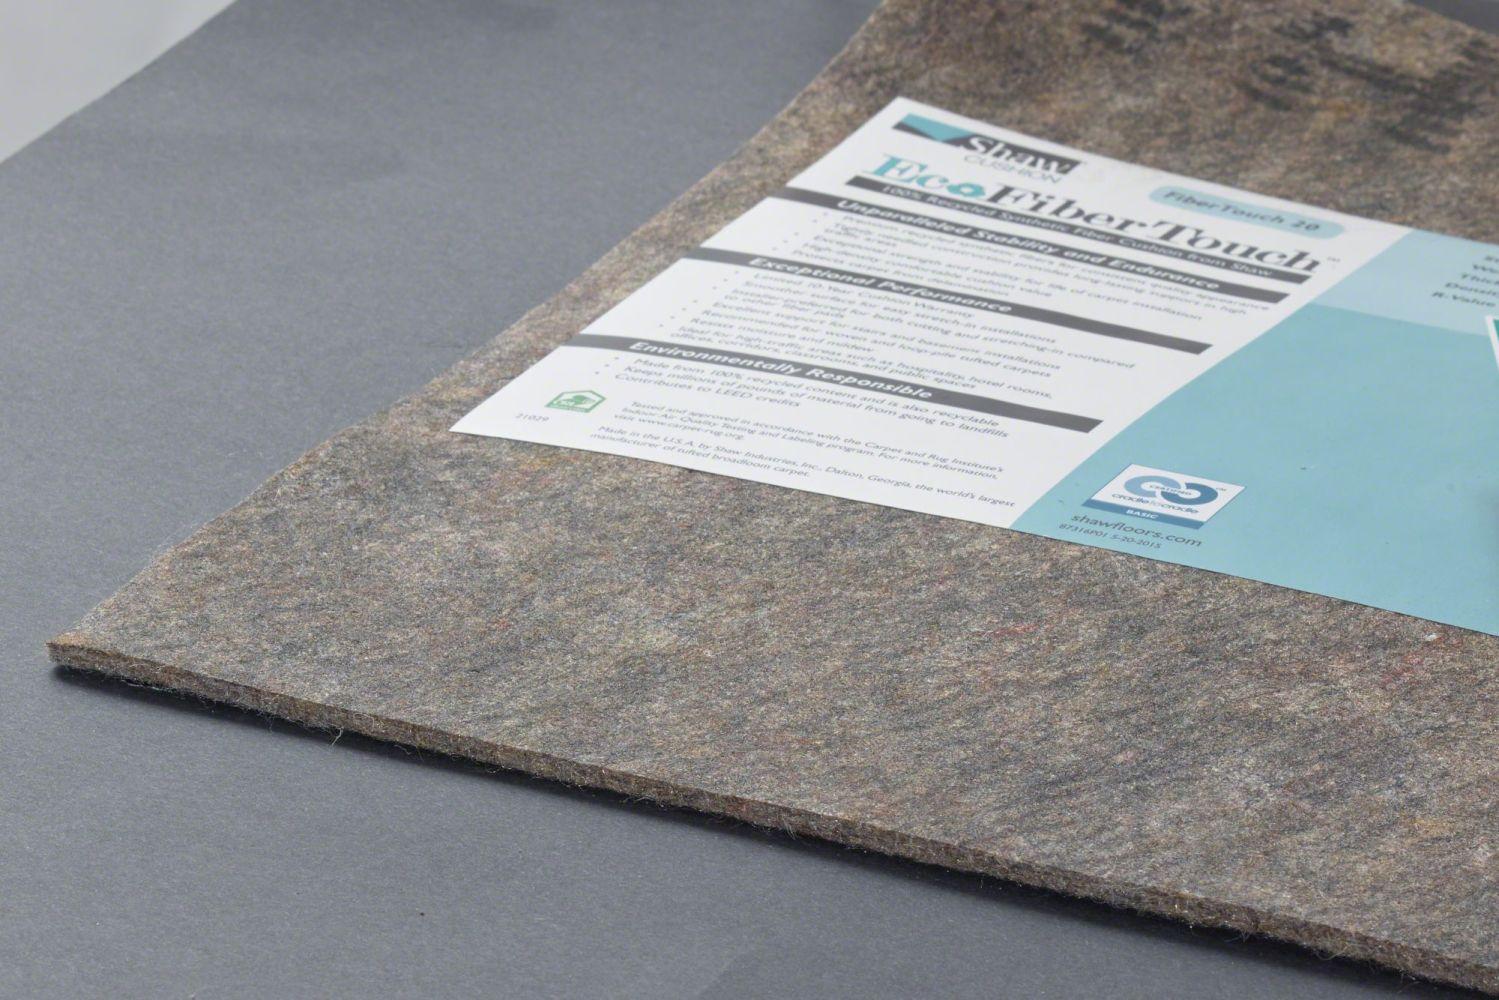 Shaw Floors Eco Edge Cushion Fibertouch 20-6 Grey 00001_230FT